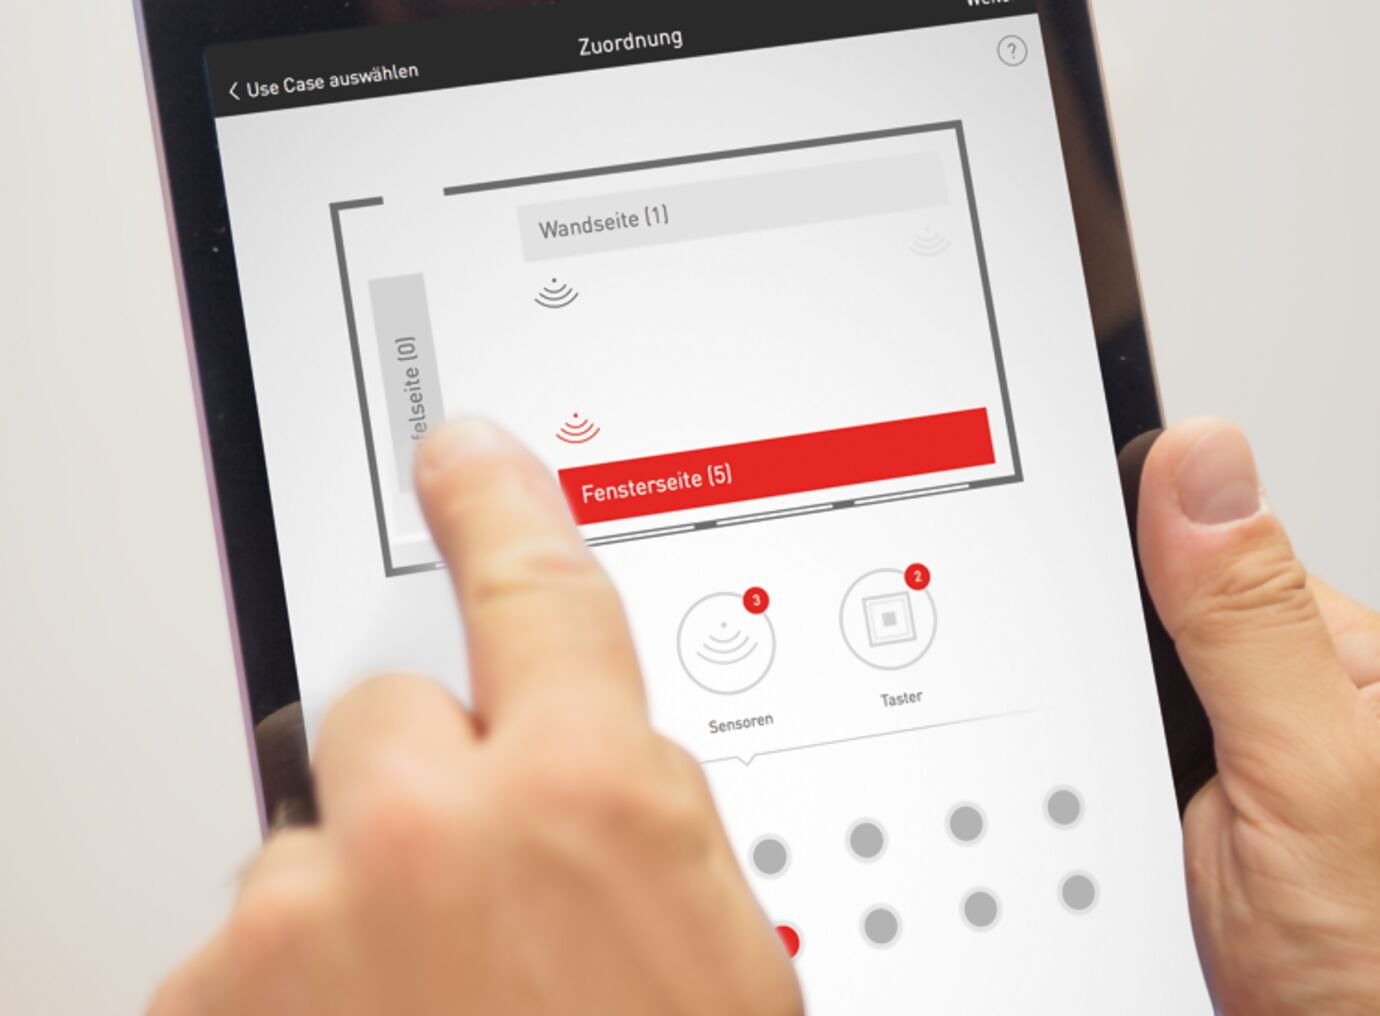 Konfiguration des LiveLink-Systems mit einem Tablet